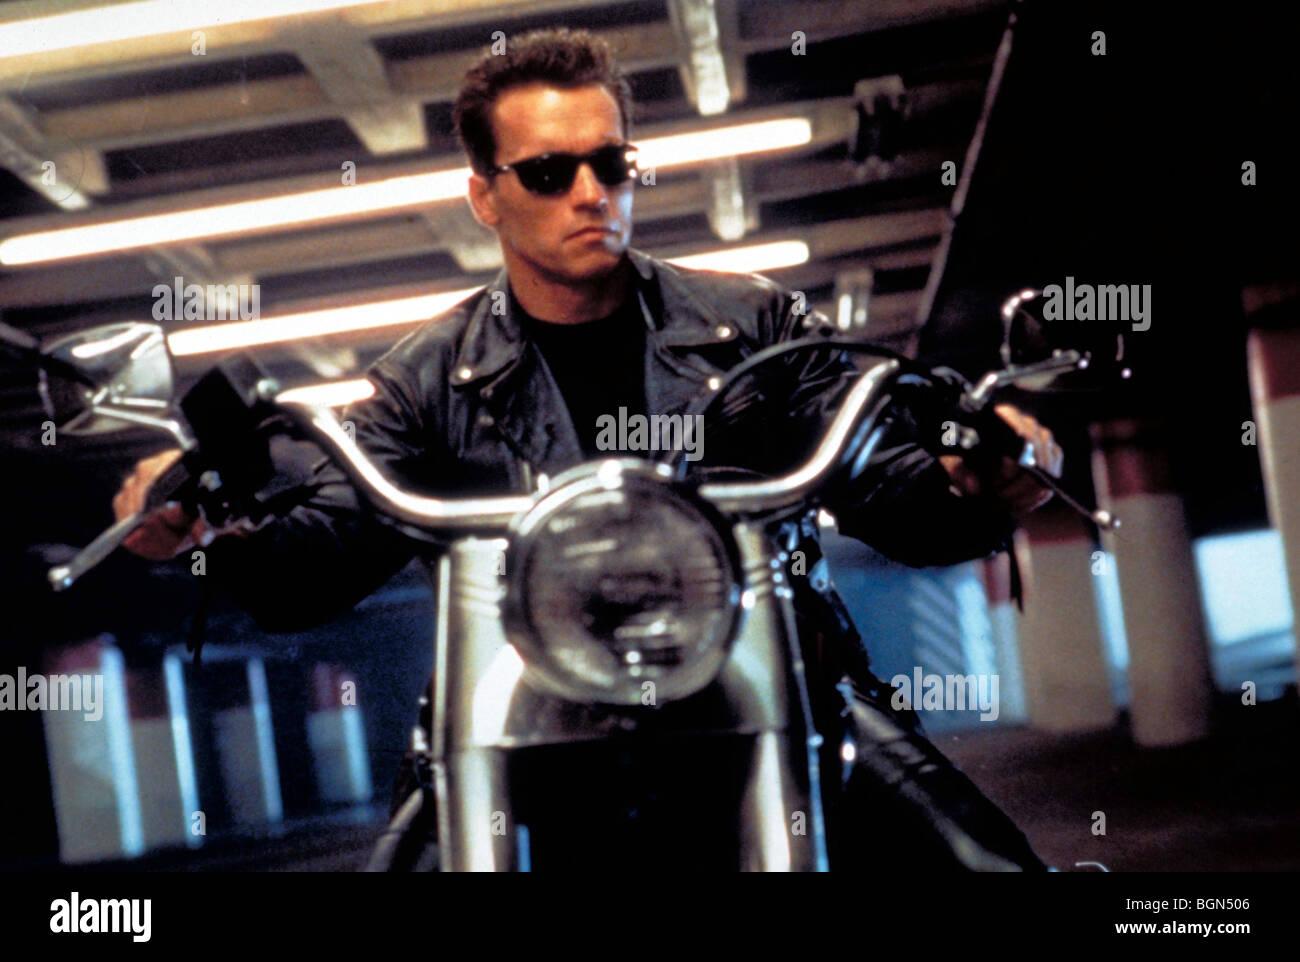 Terminator 2: Judgment Day  Year : 1991  Director : James Cameron Arnold Schwarzenegger - Stock Image